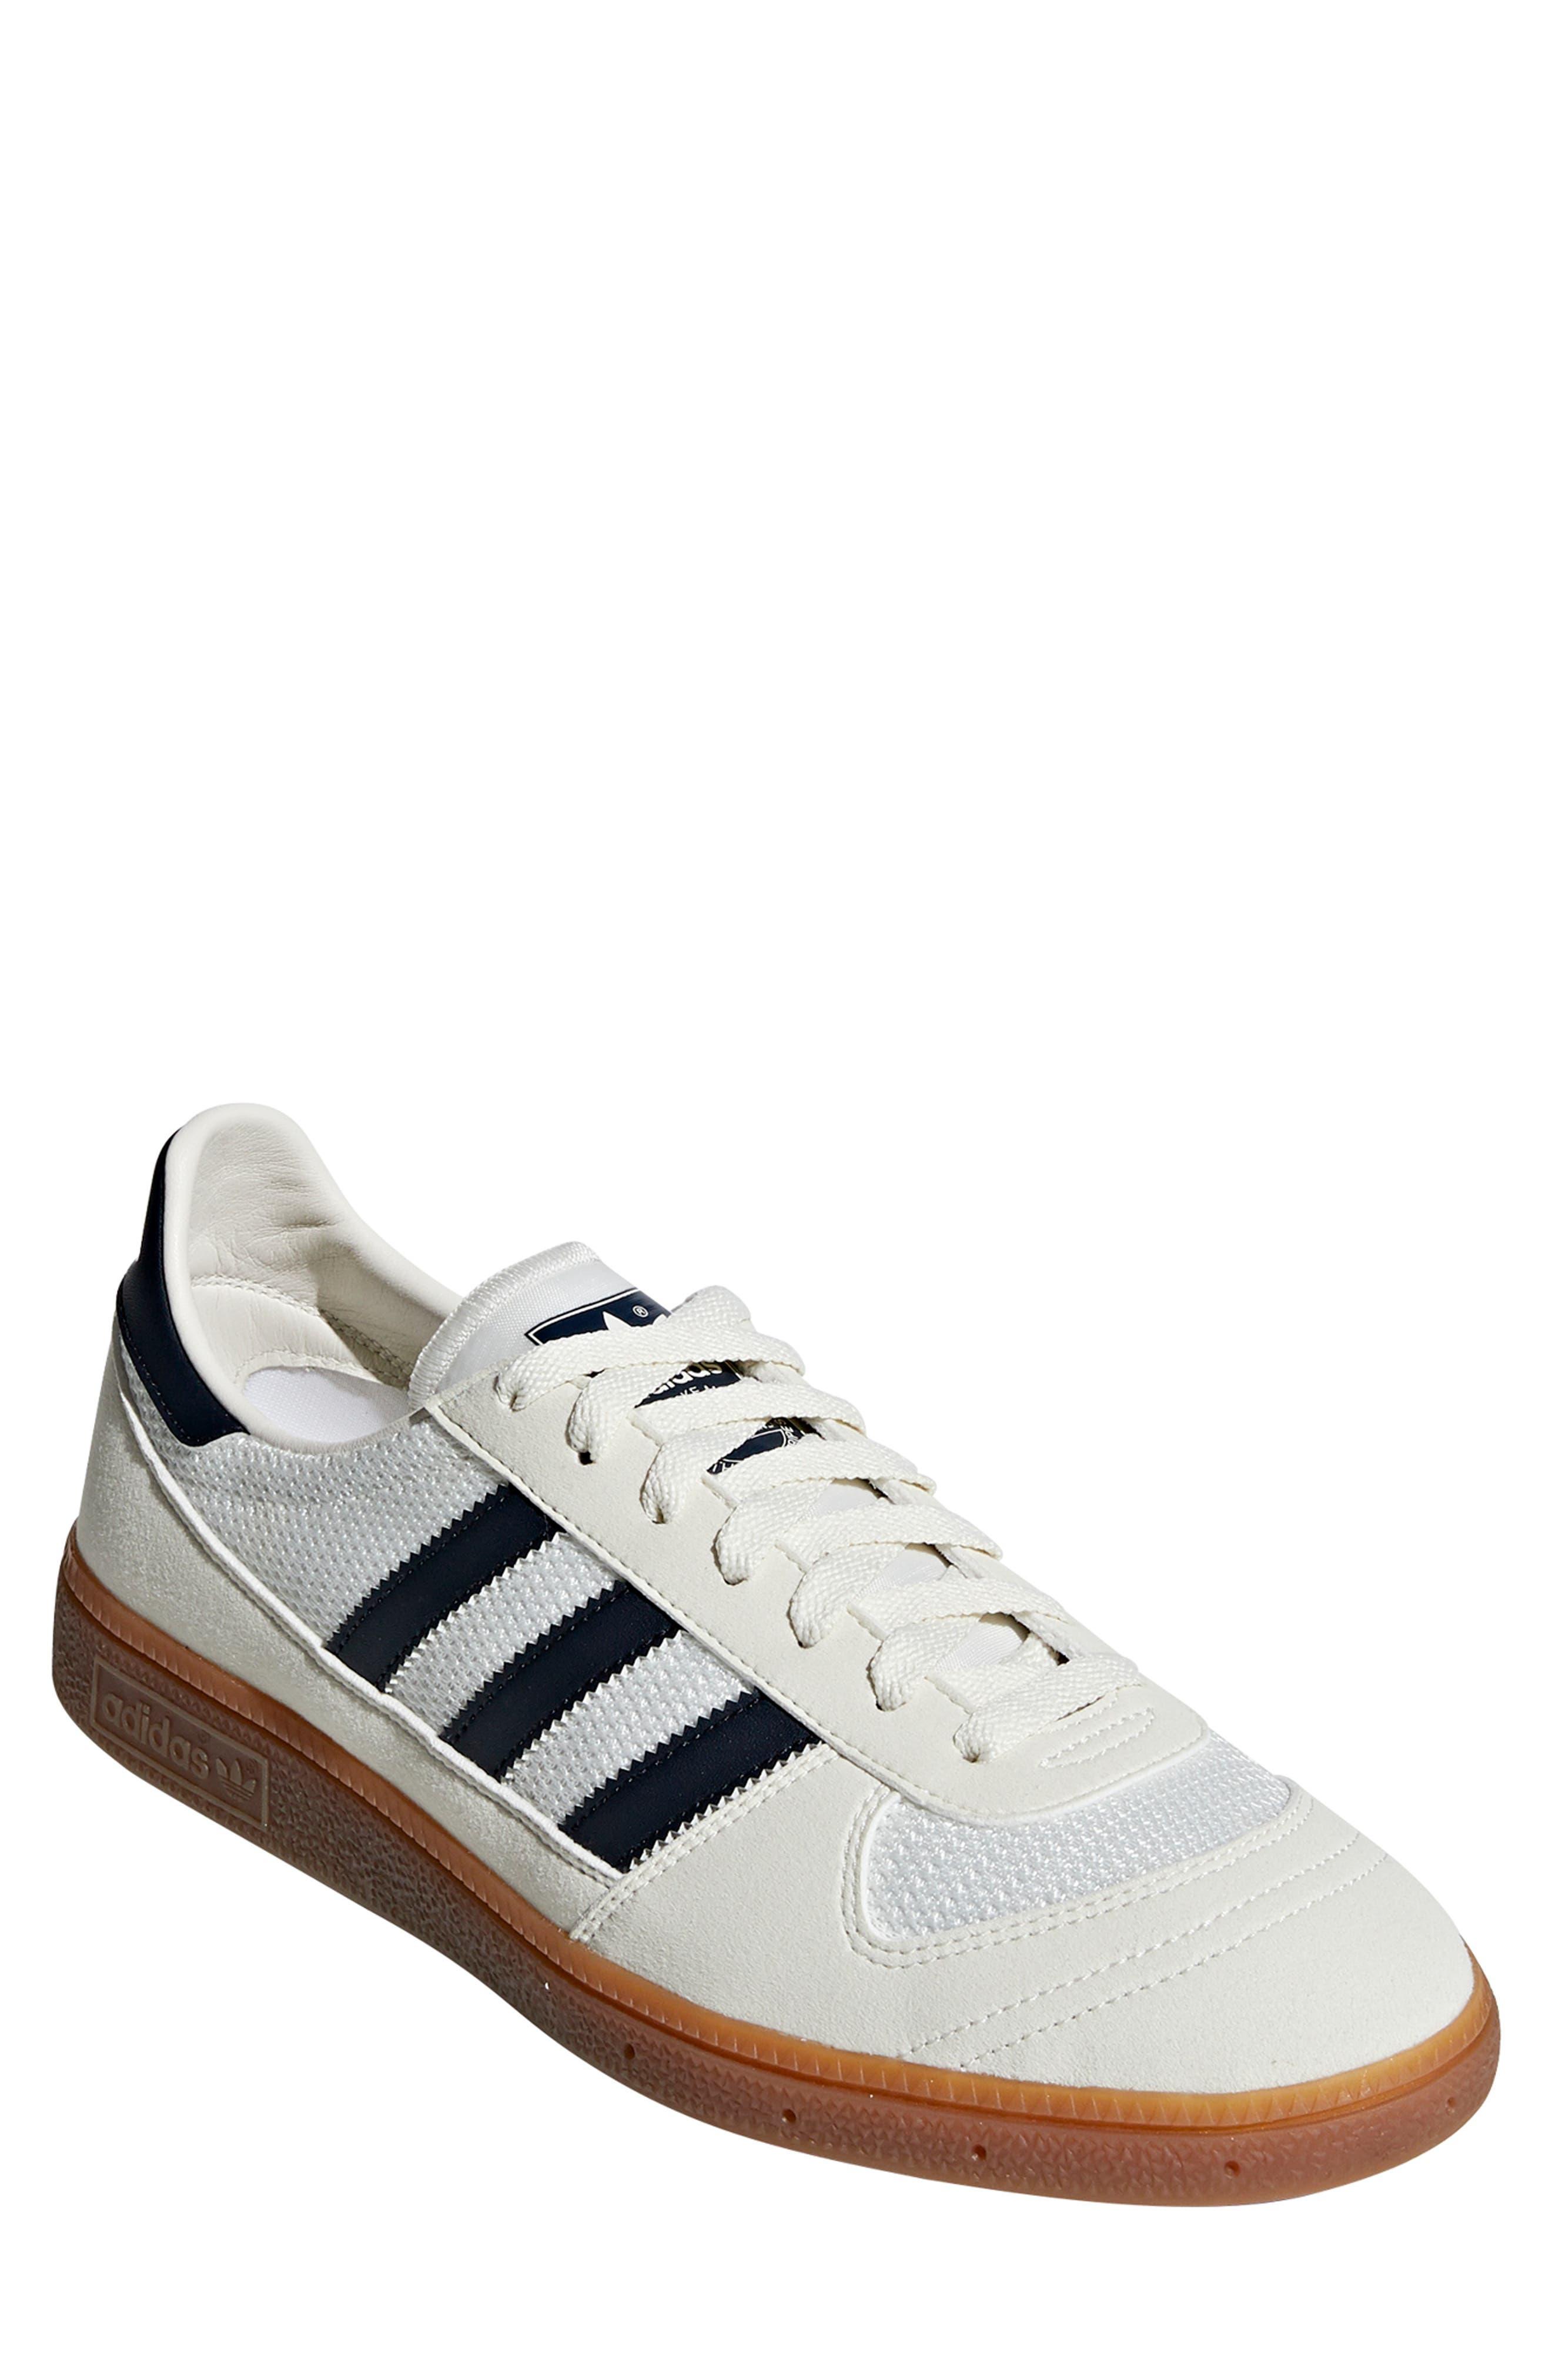 Wilsy SPZL Sneaker,                             Main thumbnail 1, color,                             OFF WHITE/ NIGHT NAVY